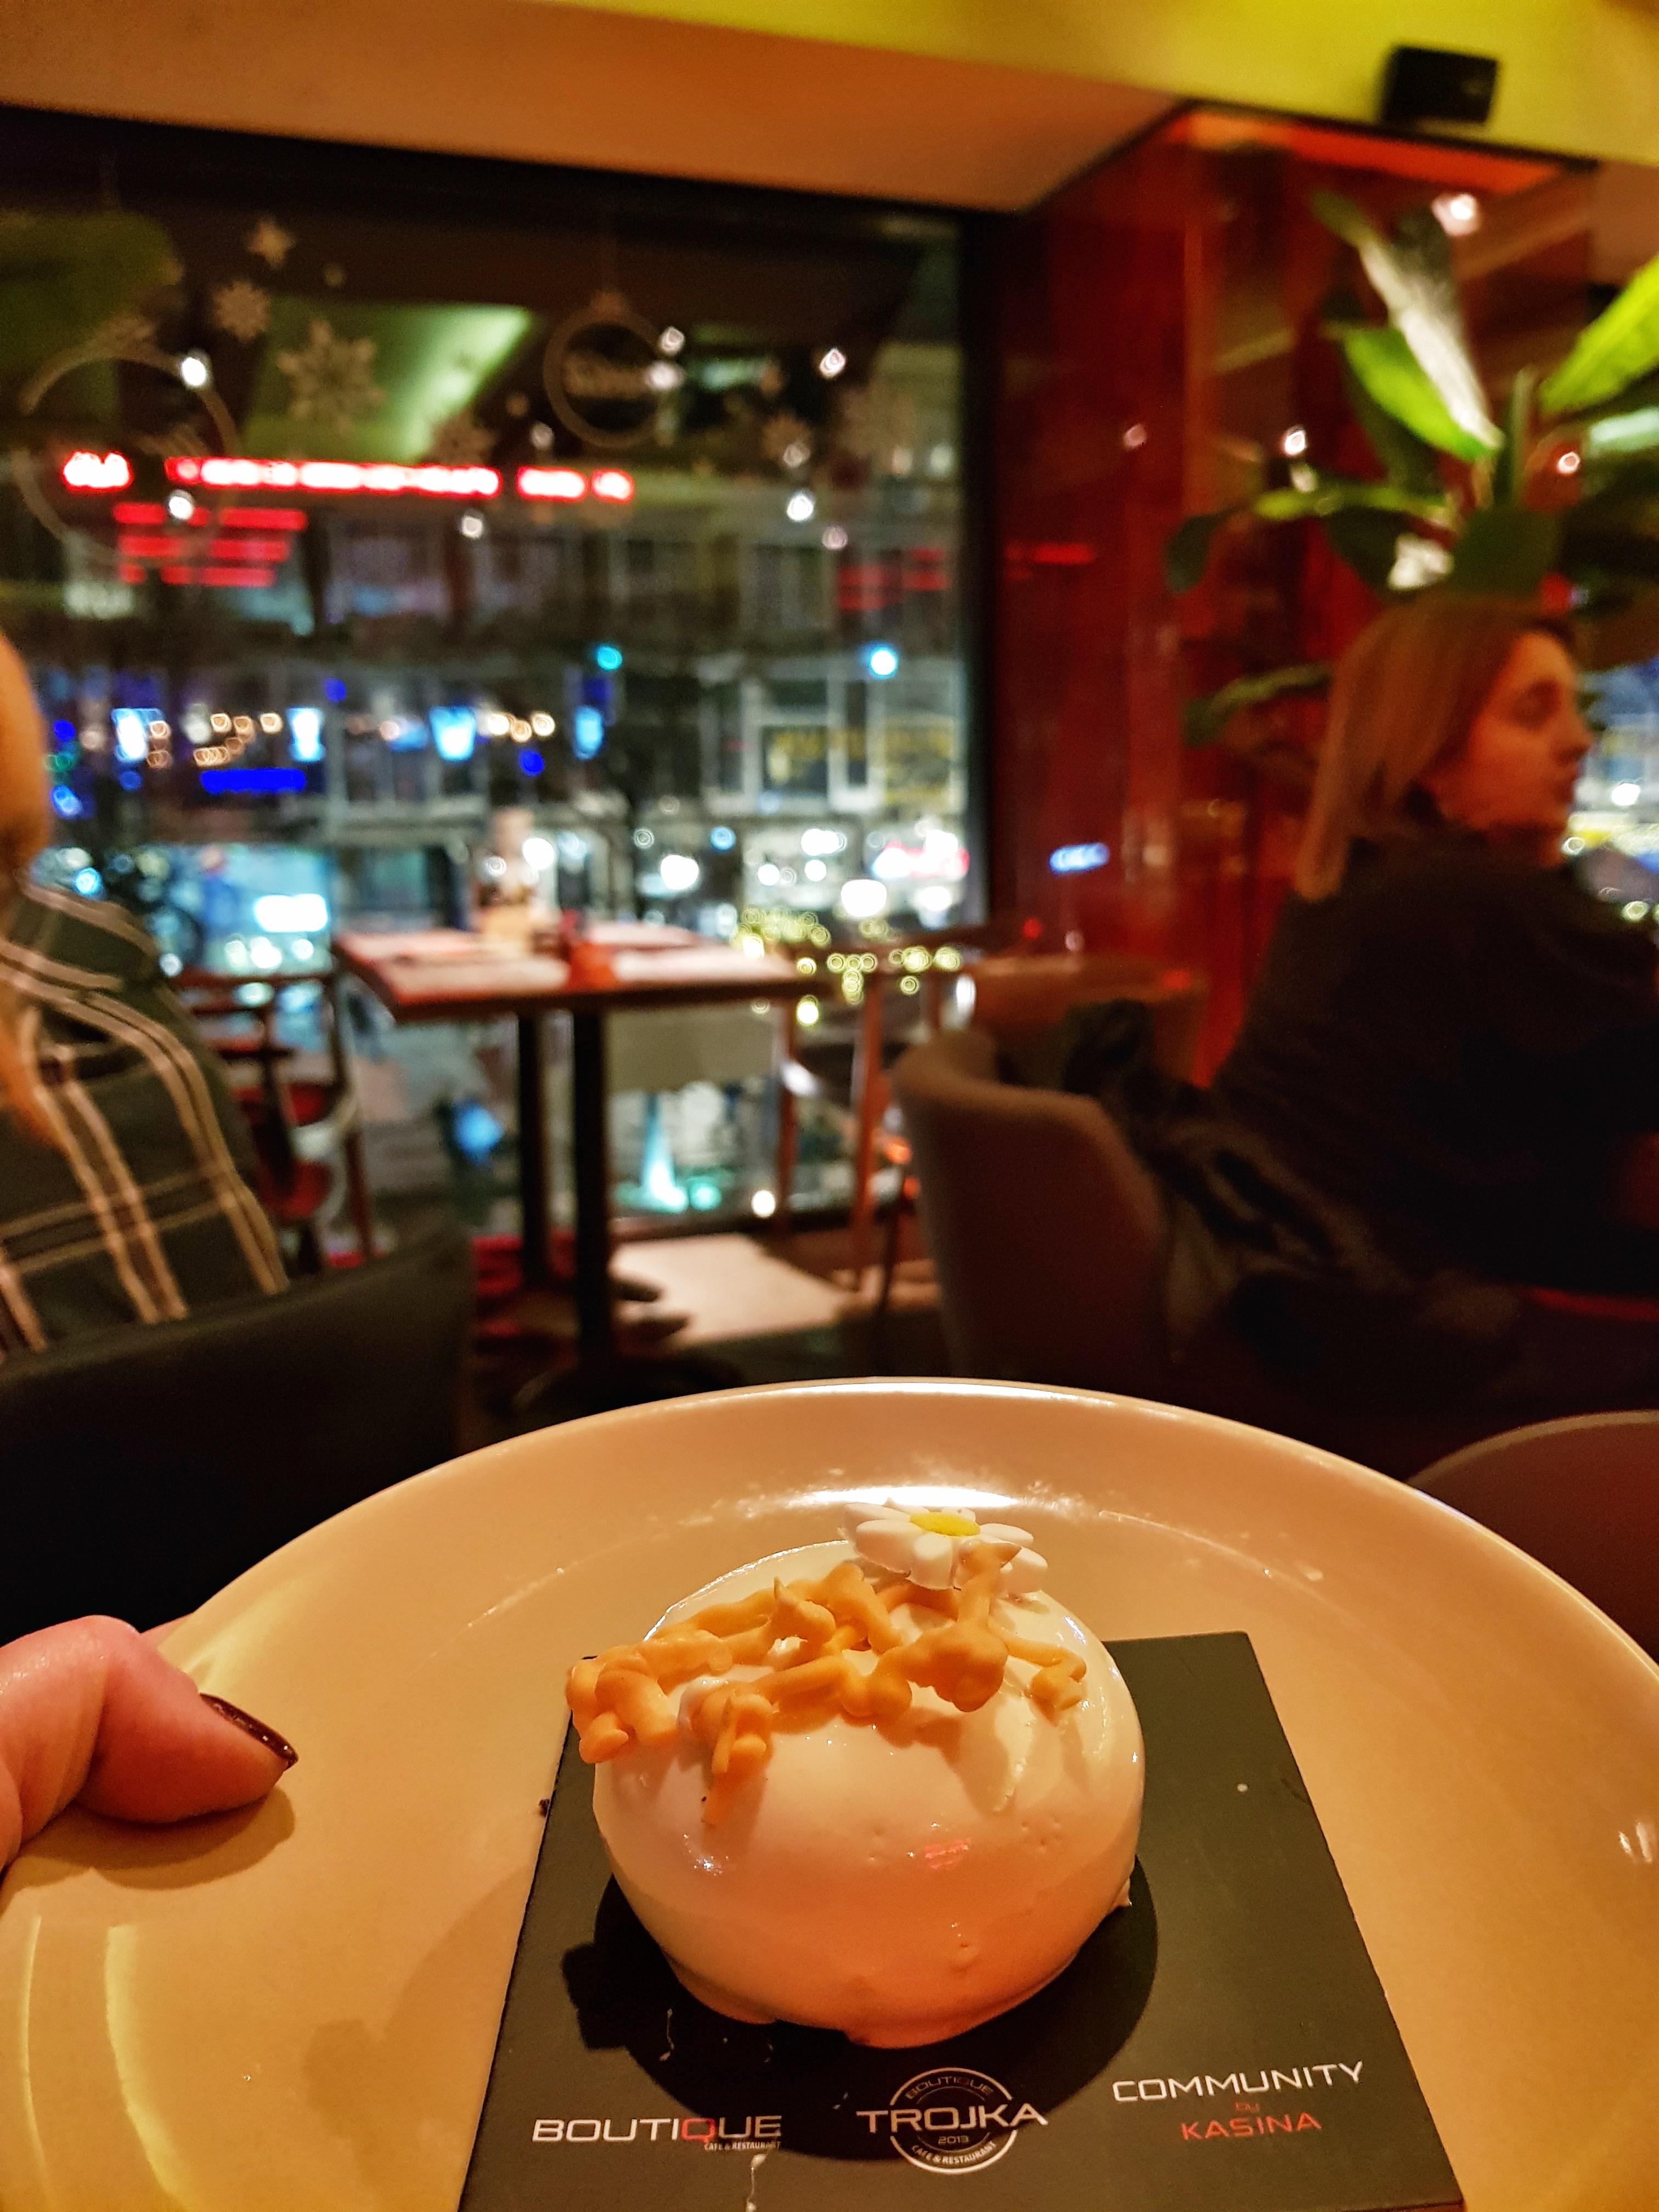 Sweets_boutique#1_belgrade_beograd